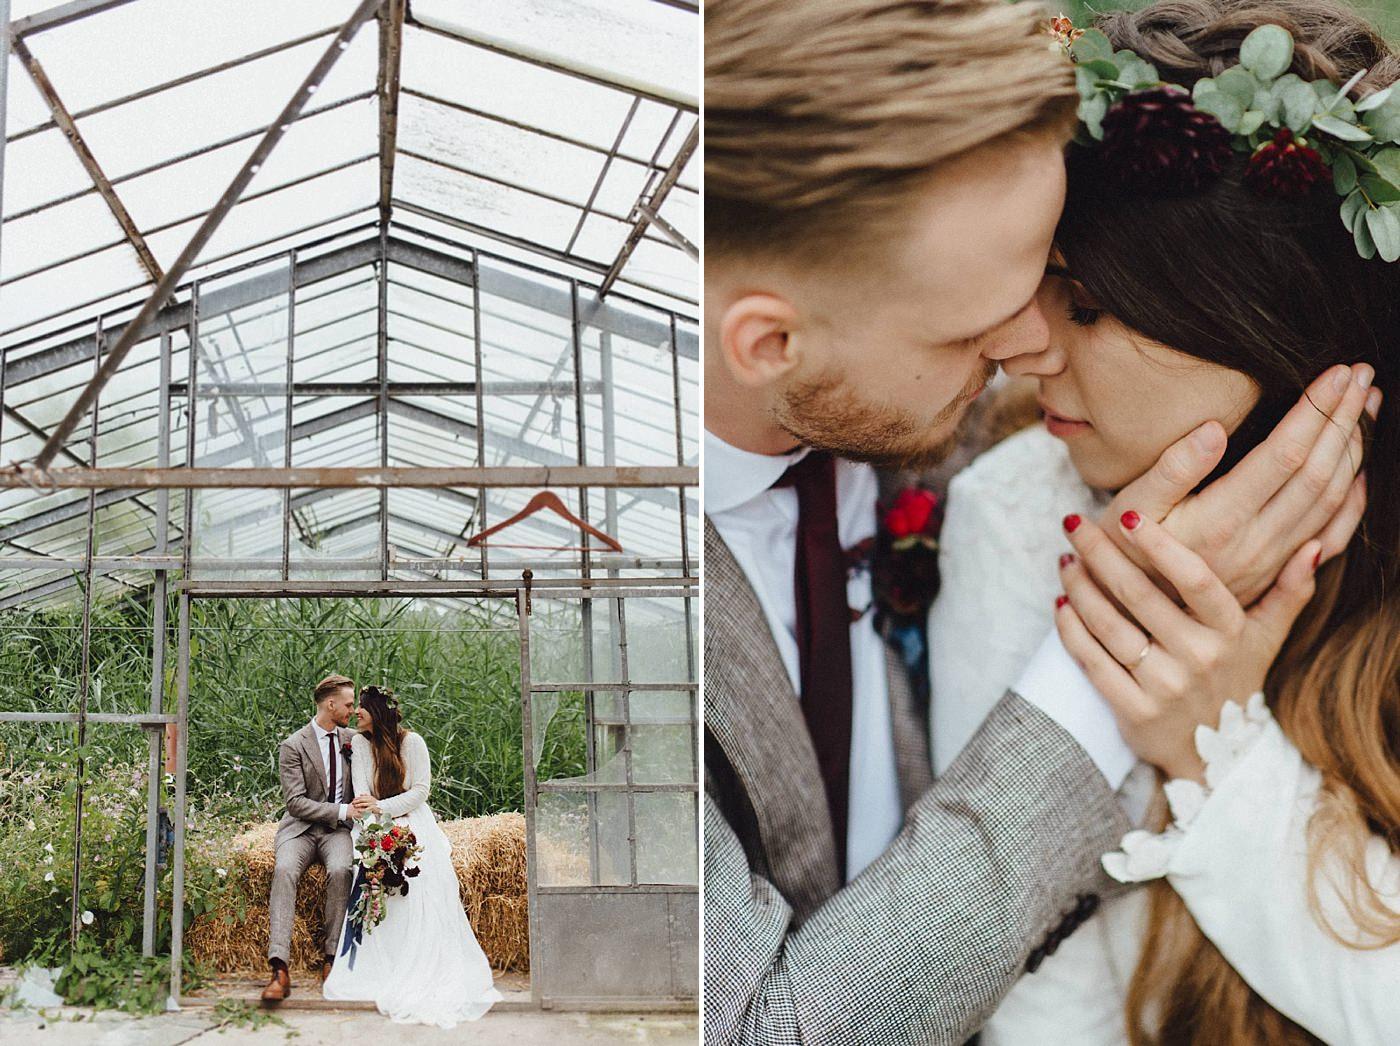 urban-elopement-wedding-171